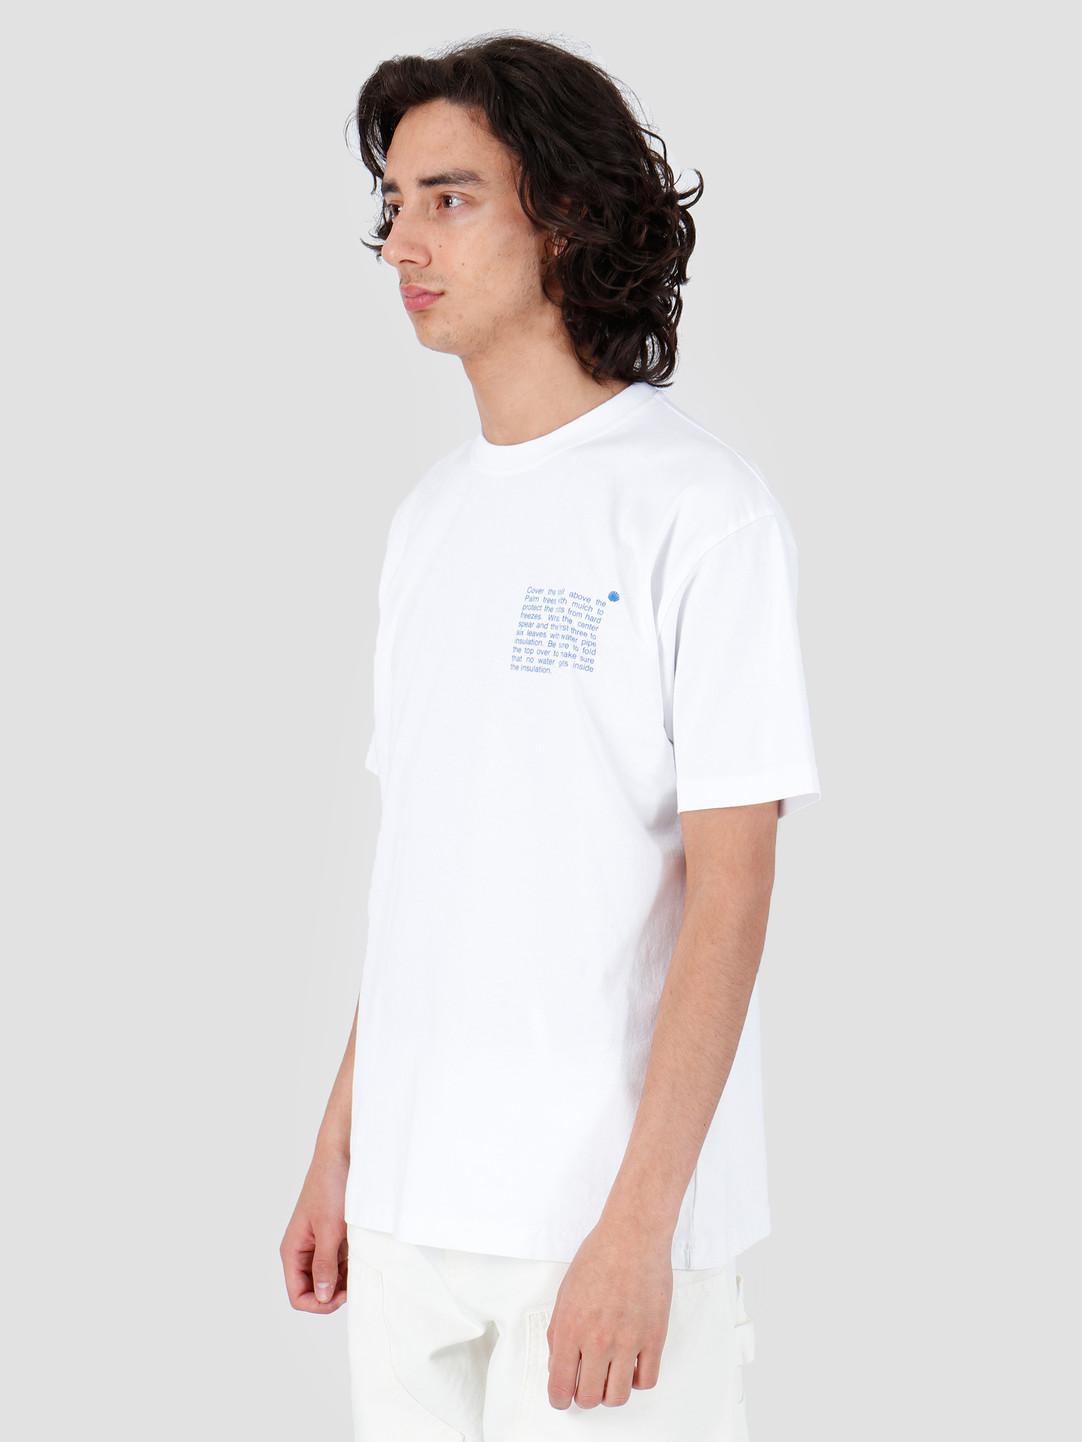 New Amsterdam Surf association New Amsterdam Surf association Cold Palm T-Shirt White 2018001